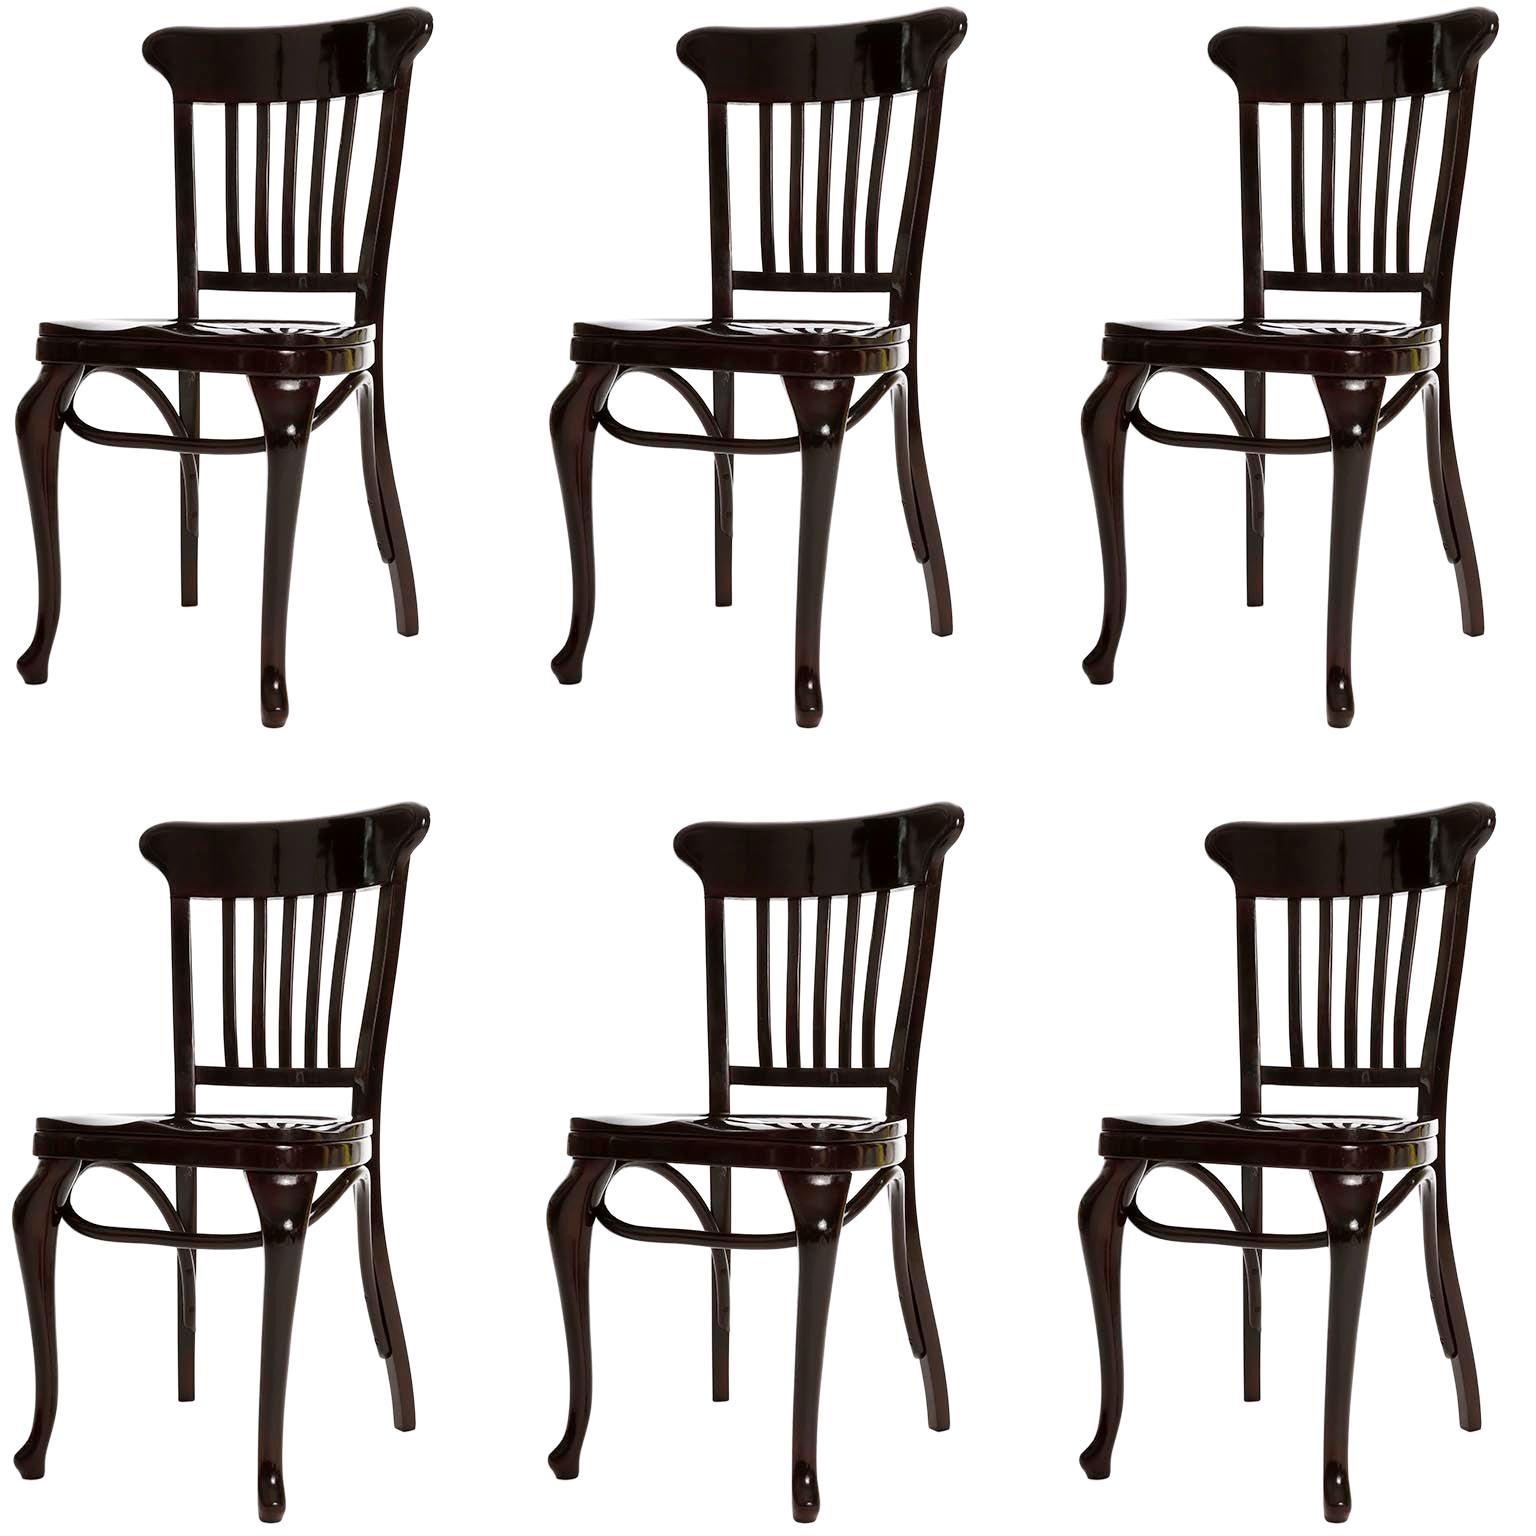 Set of Six Adolf Loos Chairs Cafe Capua Vienna, Austria, Thonet, 1913